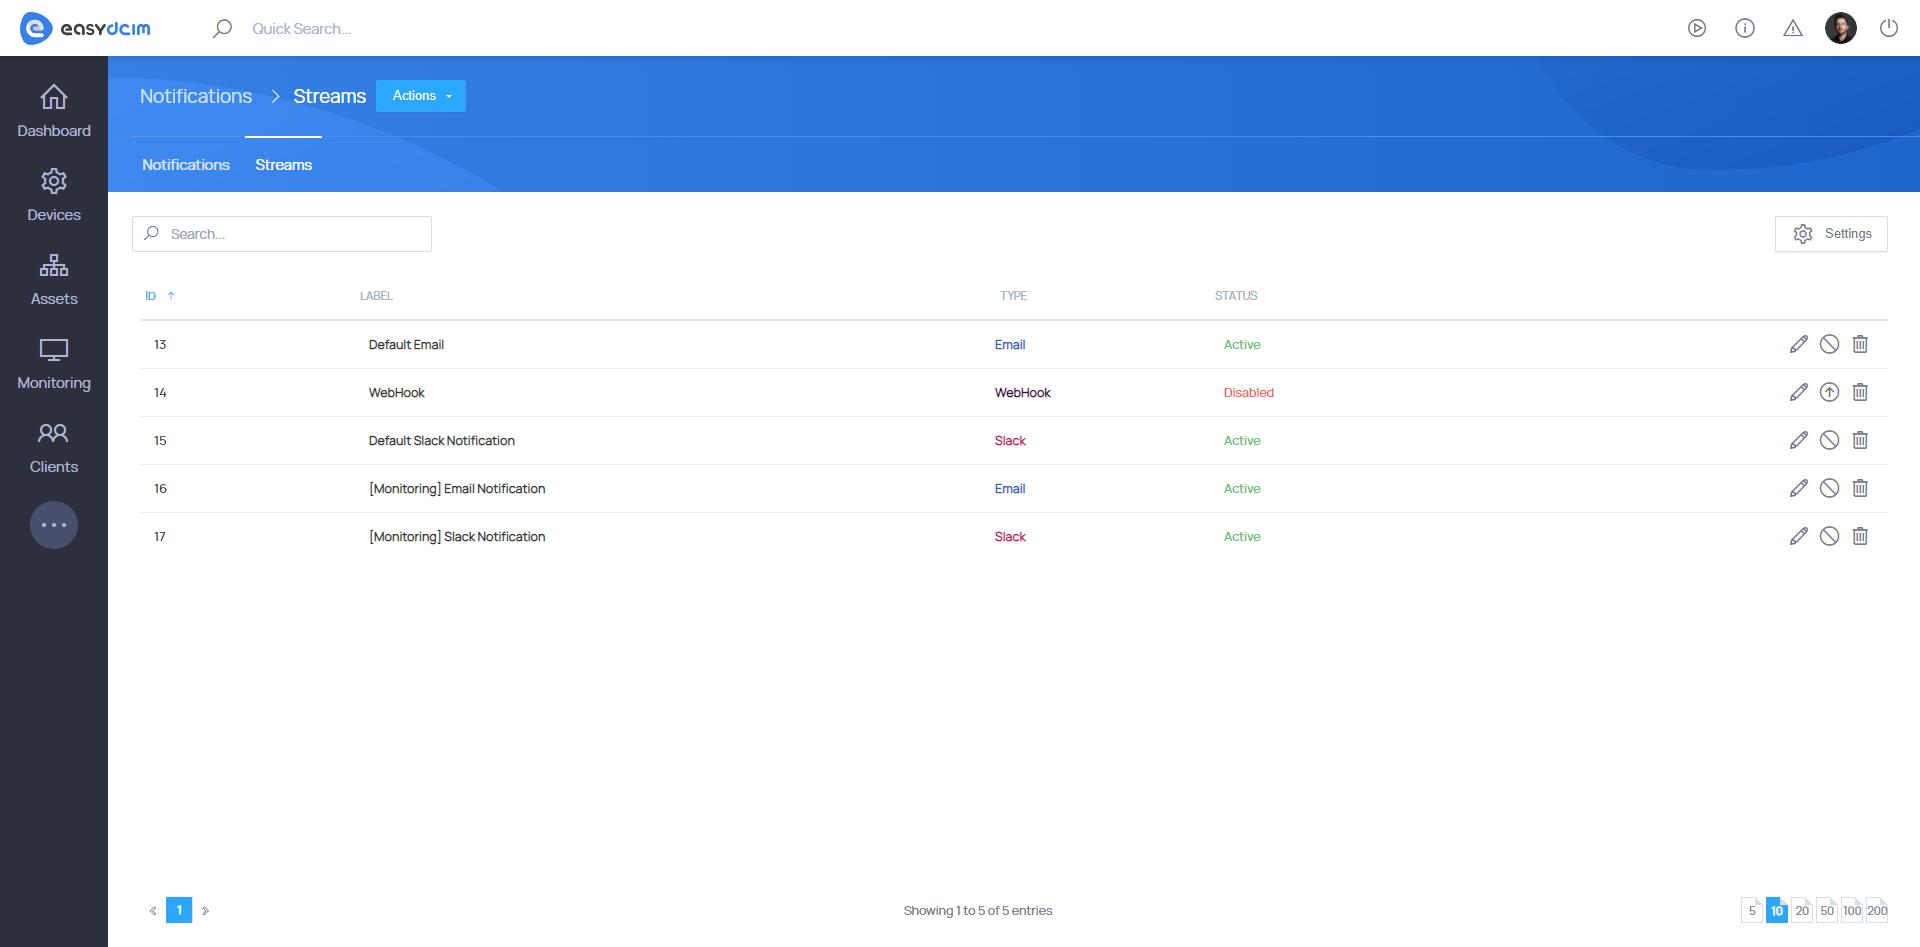 Notifications Streams - EasyDCIM v1.7.0